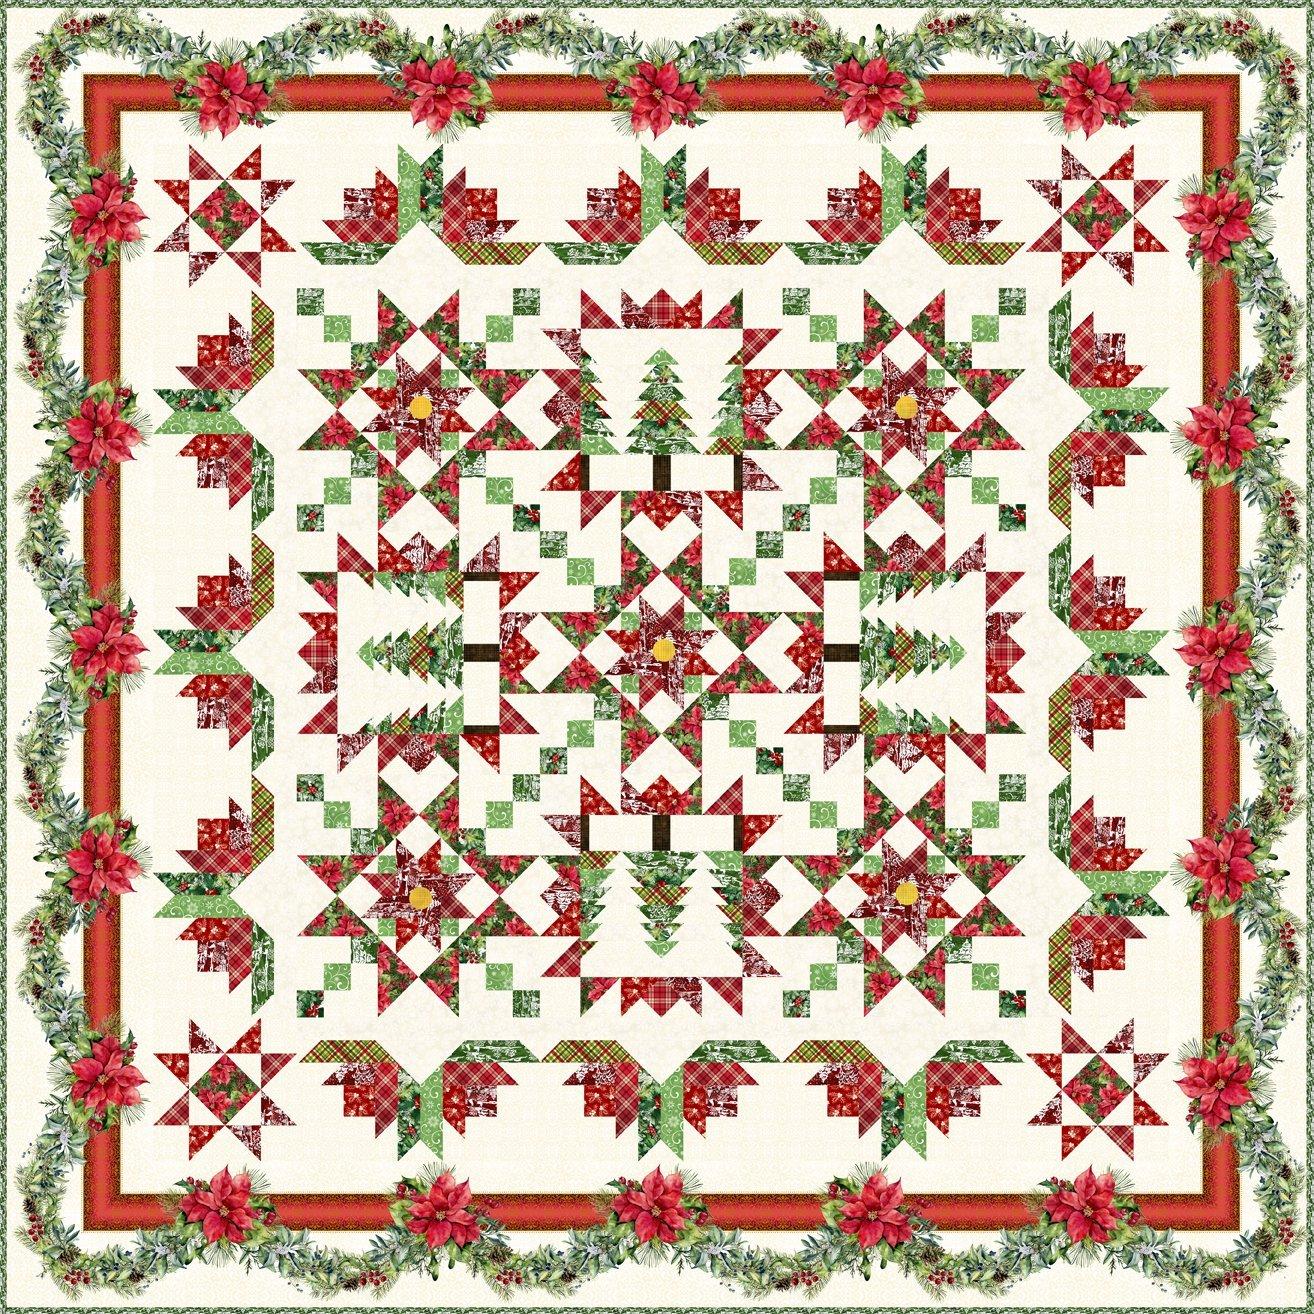 A Poinsettia Winter Quilt BOM Registration